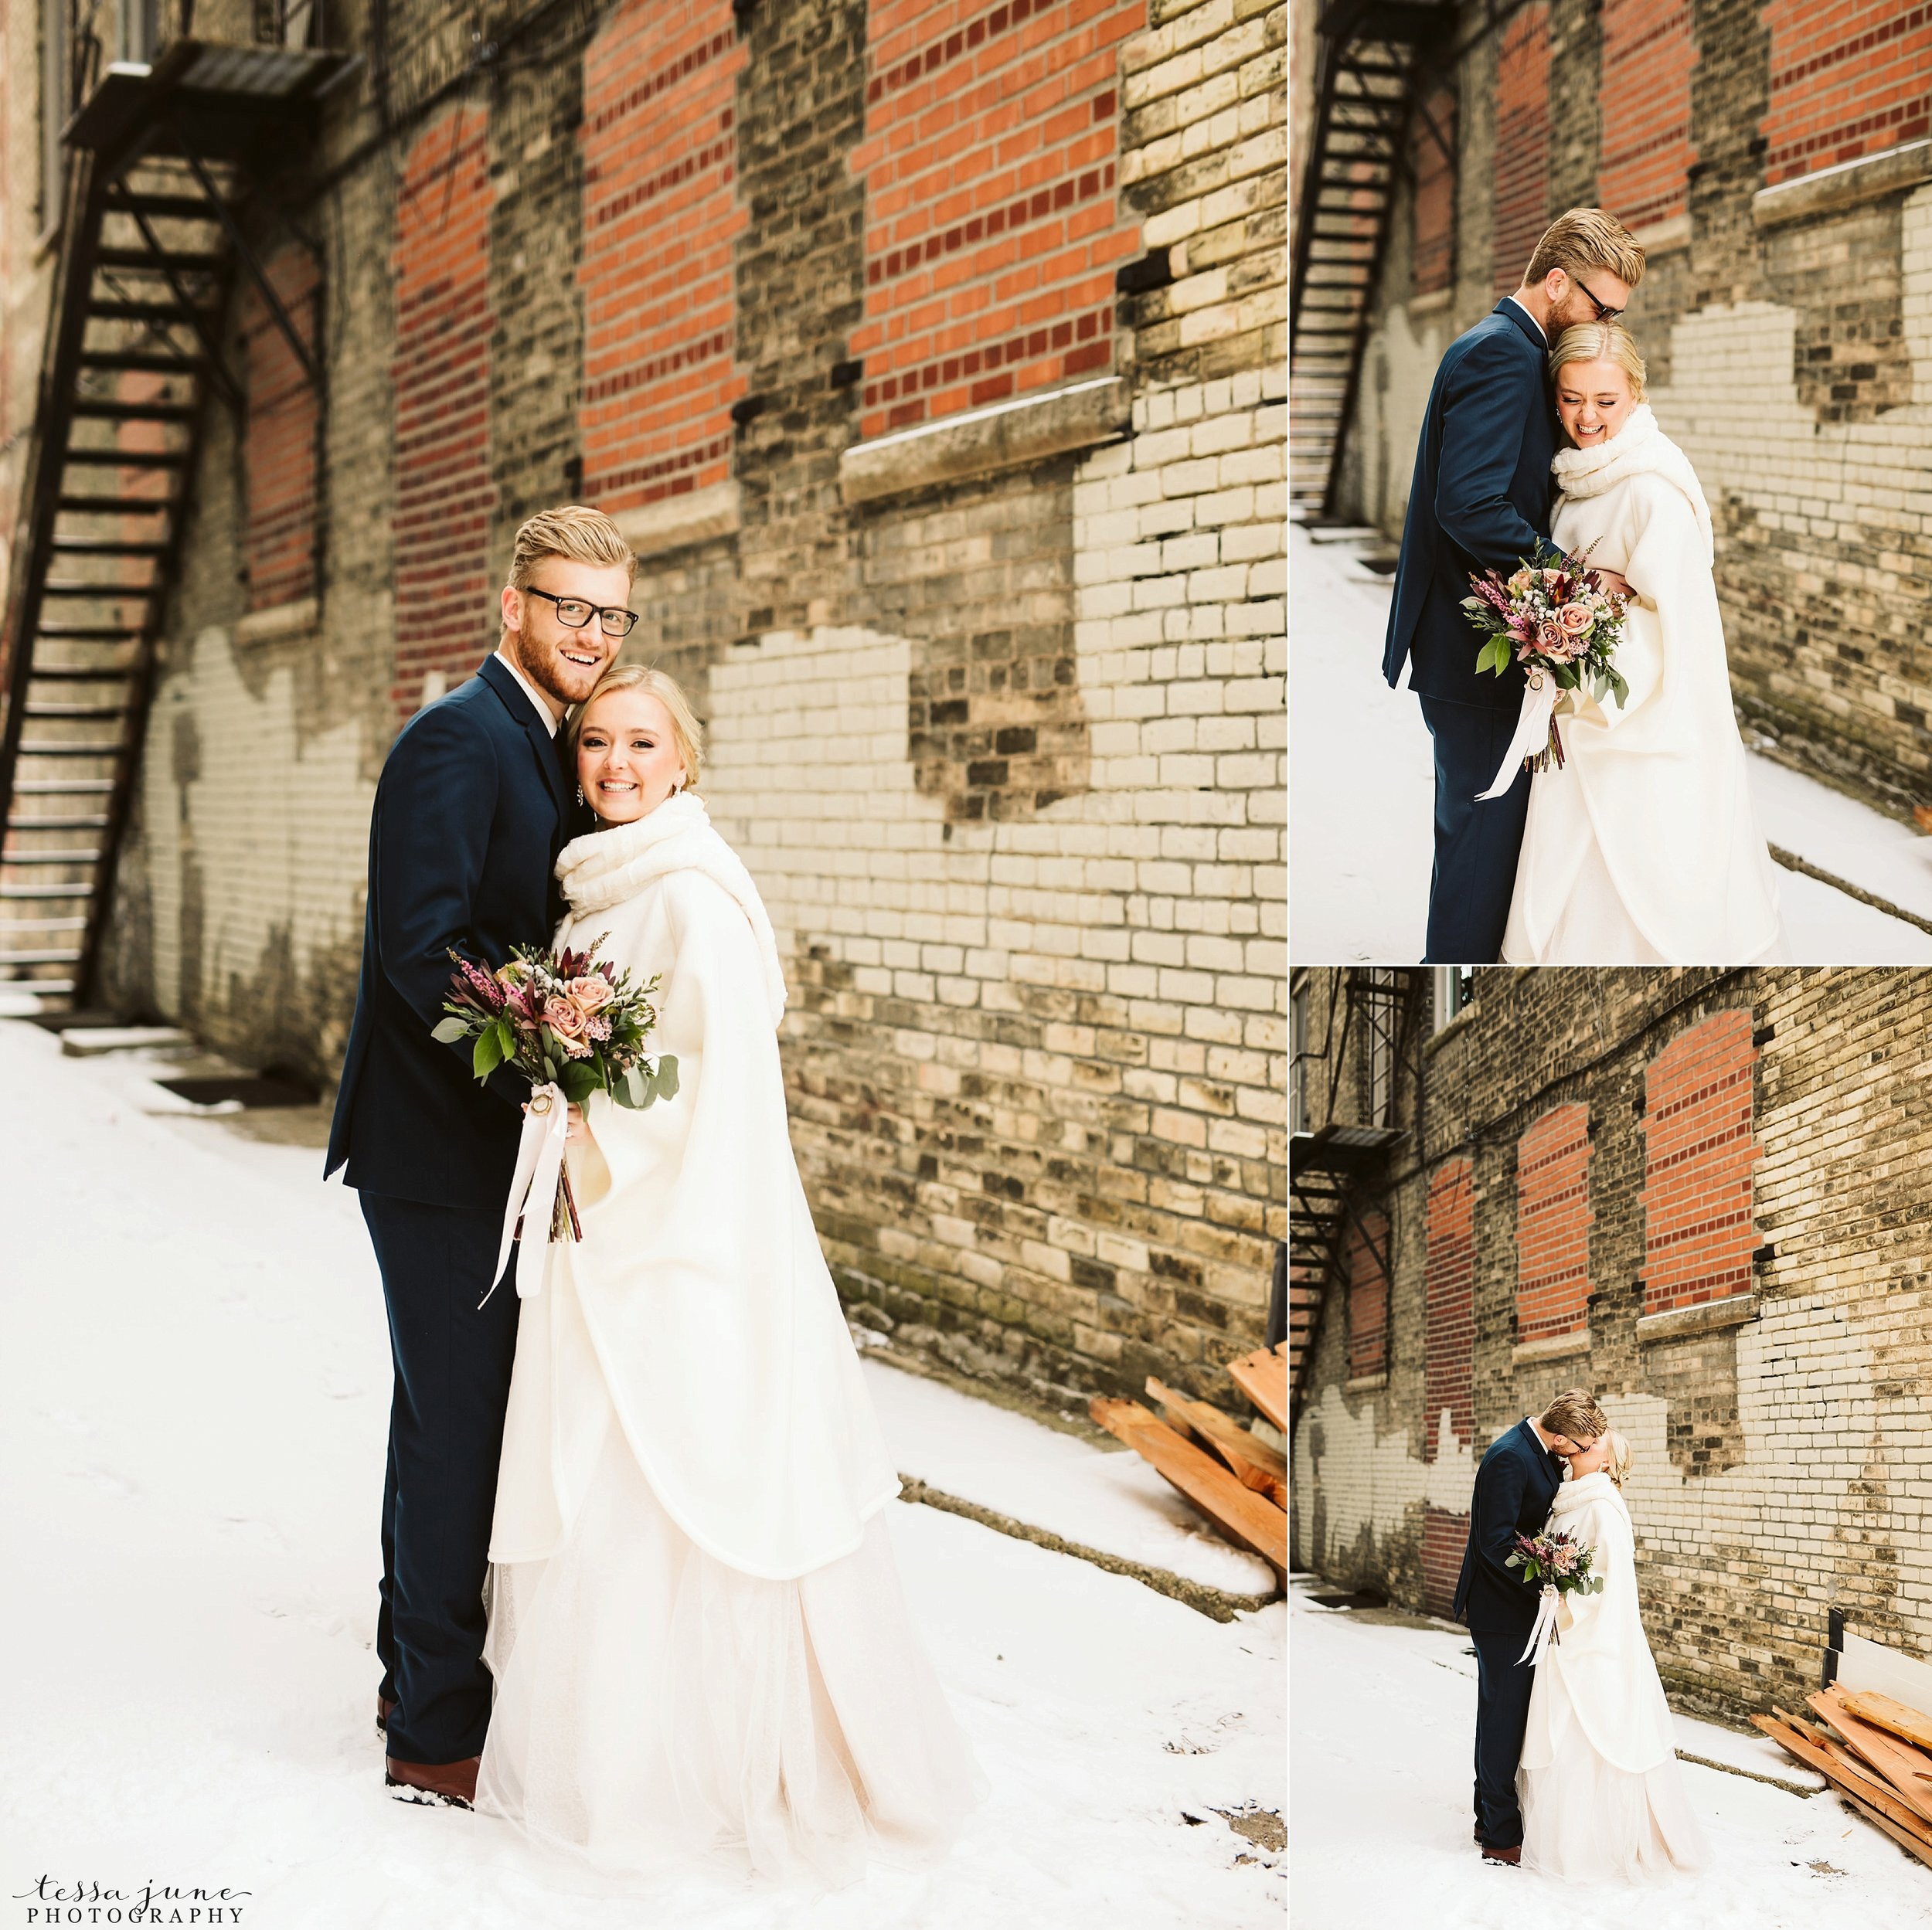 the-3-ten-event-venue-november-elegant-cozy-wedding-faribault-minnesota-50.jpg